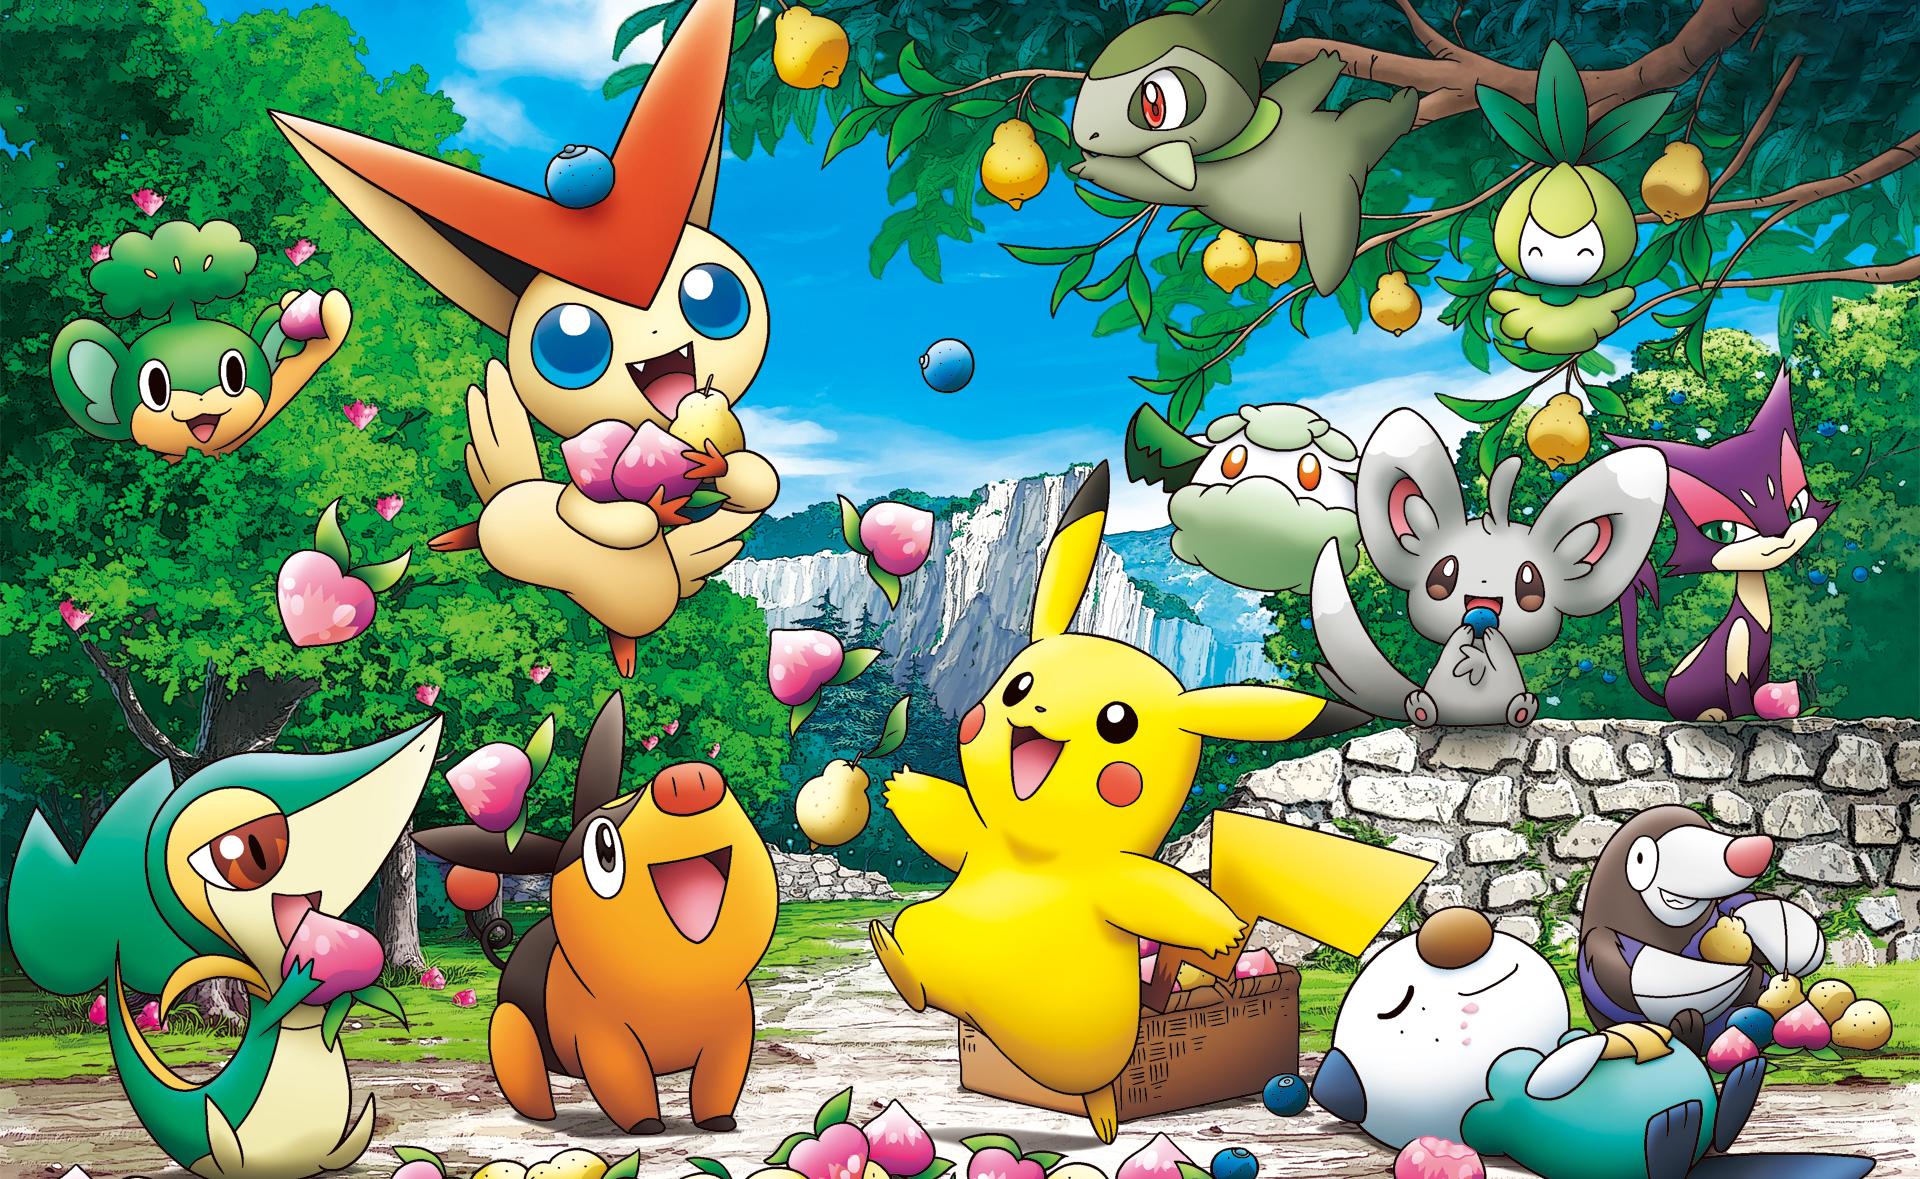 Wallpaper Iphone 5 Anime Pokemon Poster 4 Fond D 233 Cran And Arri 232 Re Plan 1439x878